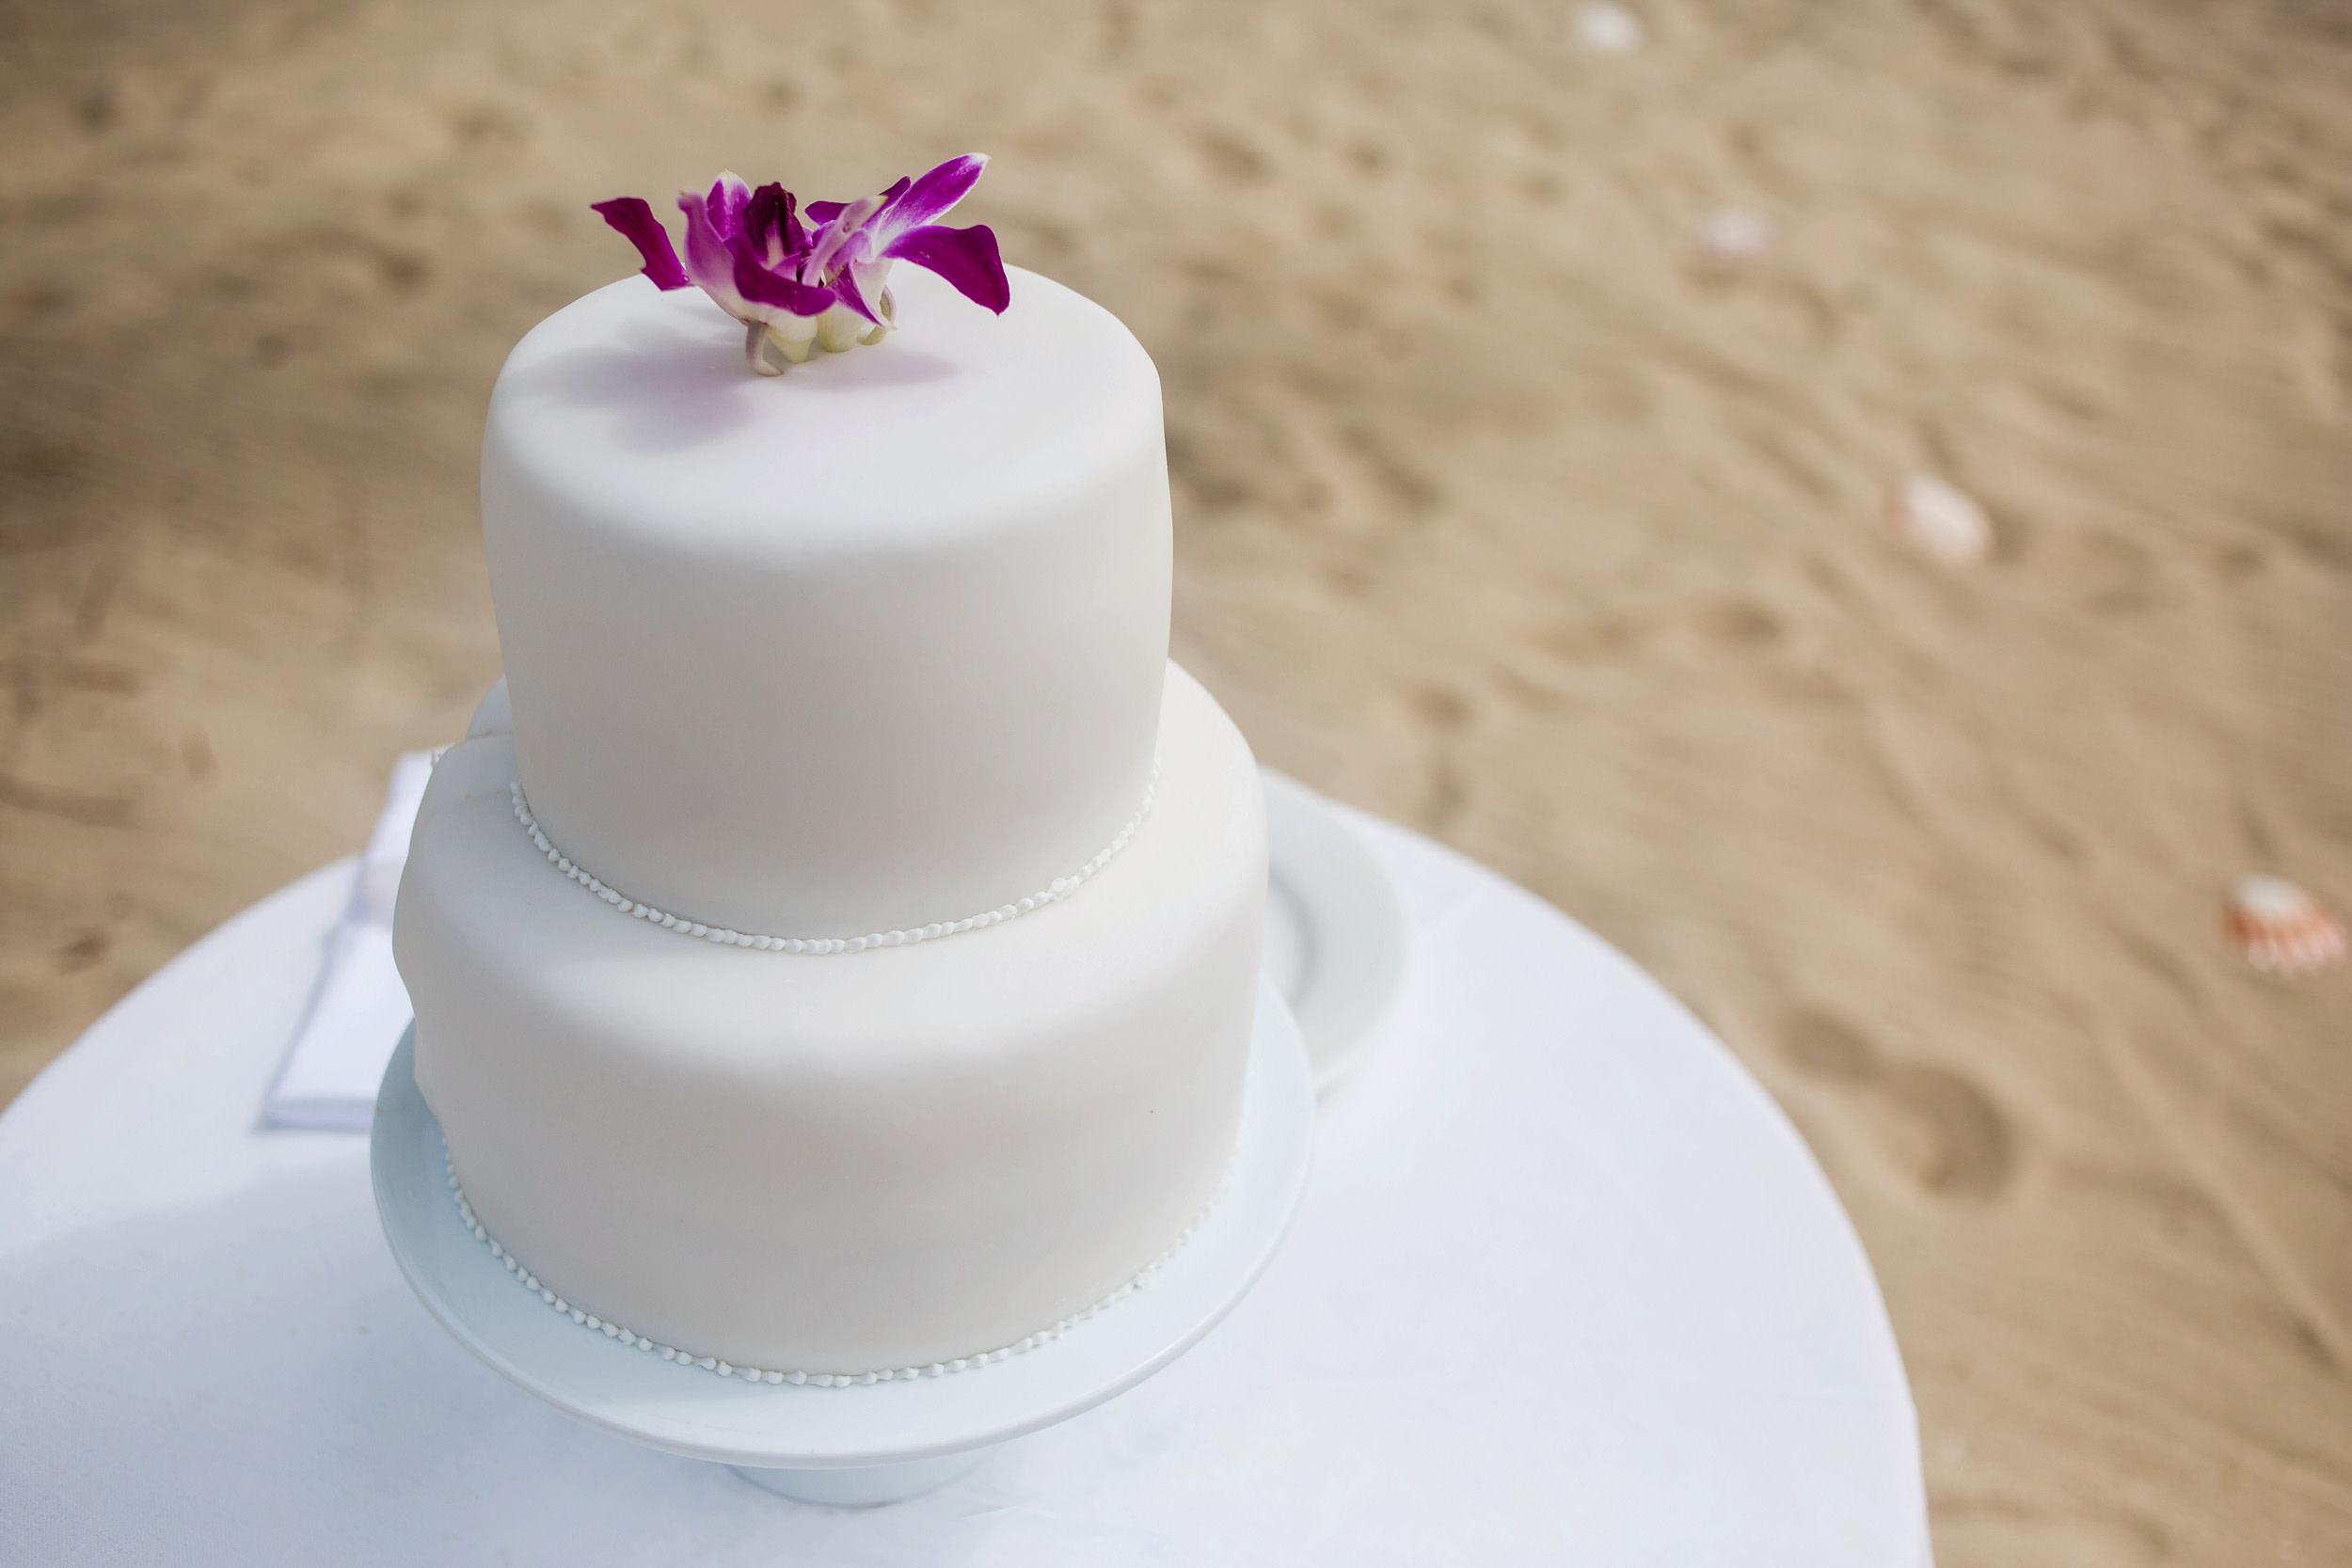 Wedding cake provided by destination wedding venue.